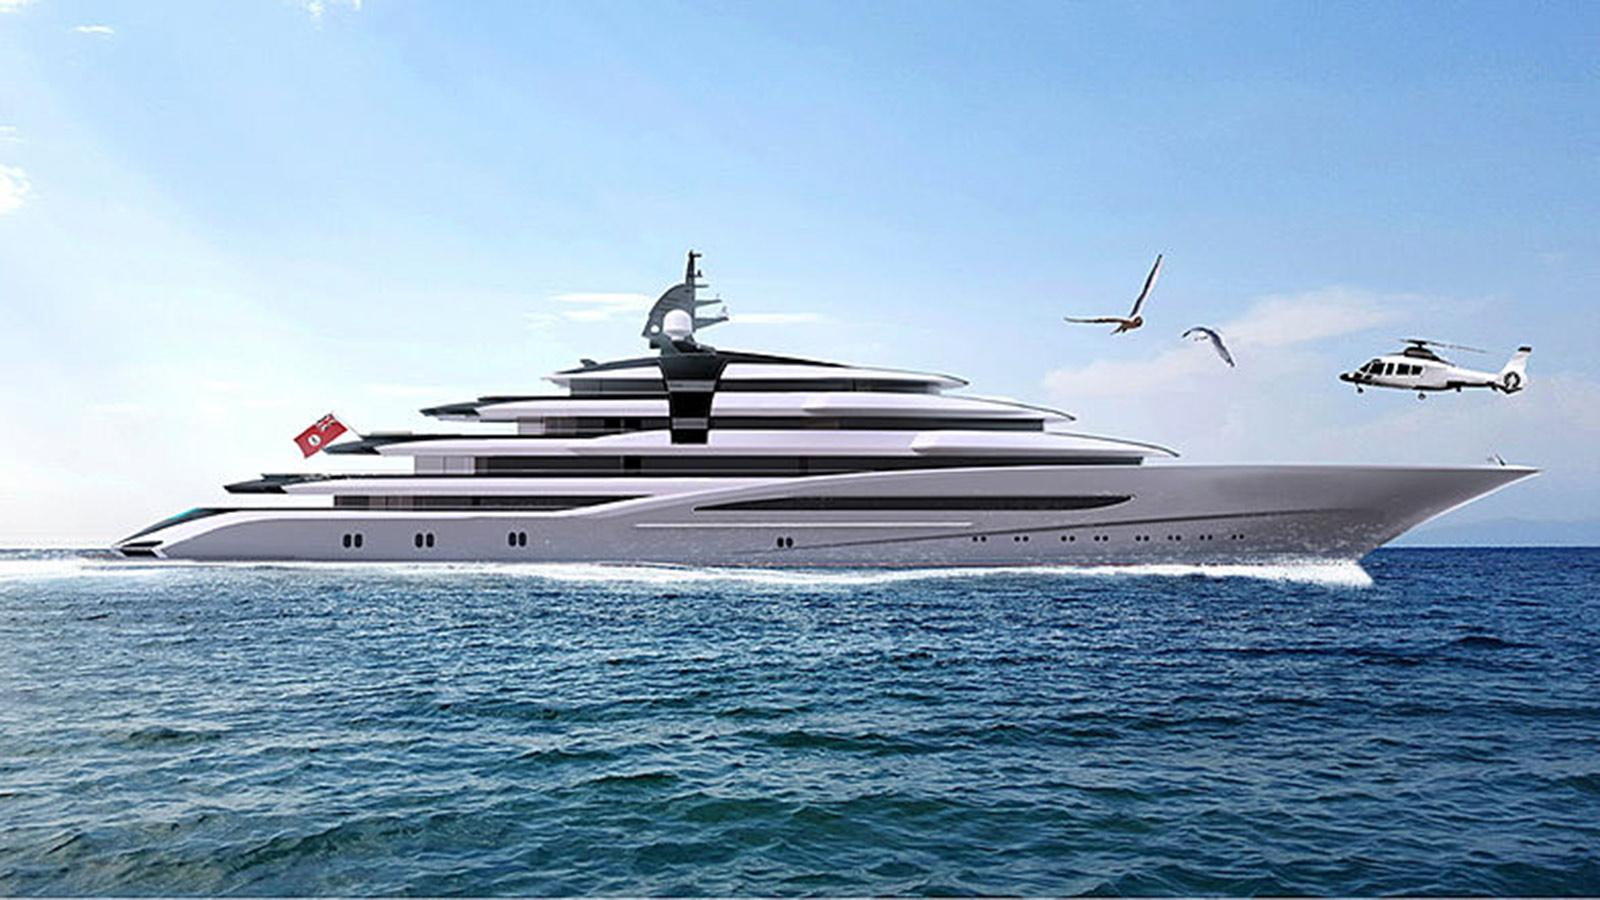 new-build-125m-lurssen-motor-yacht-project-jag-sold